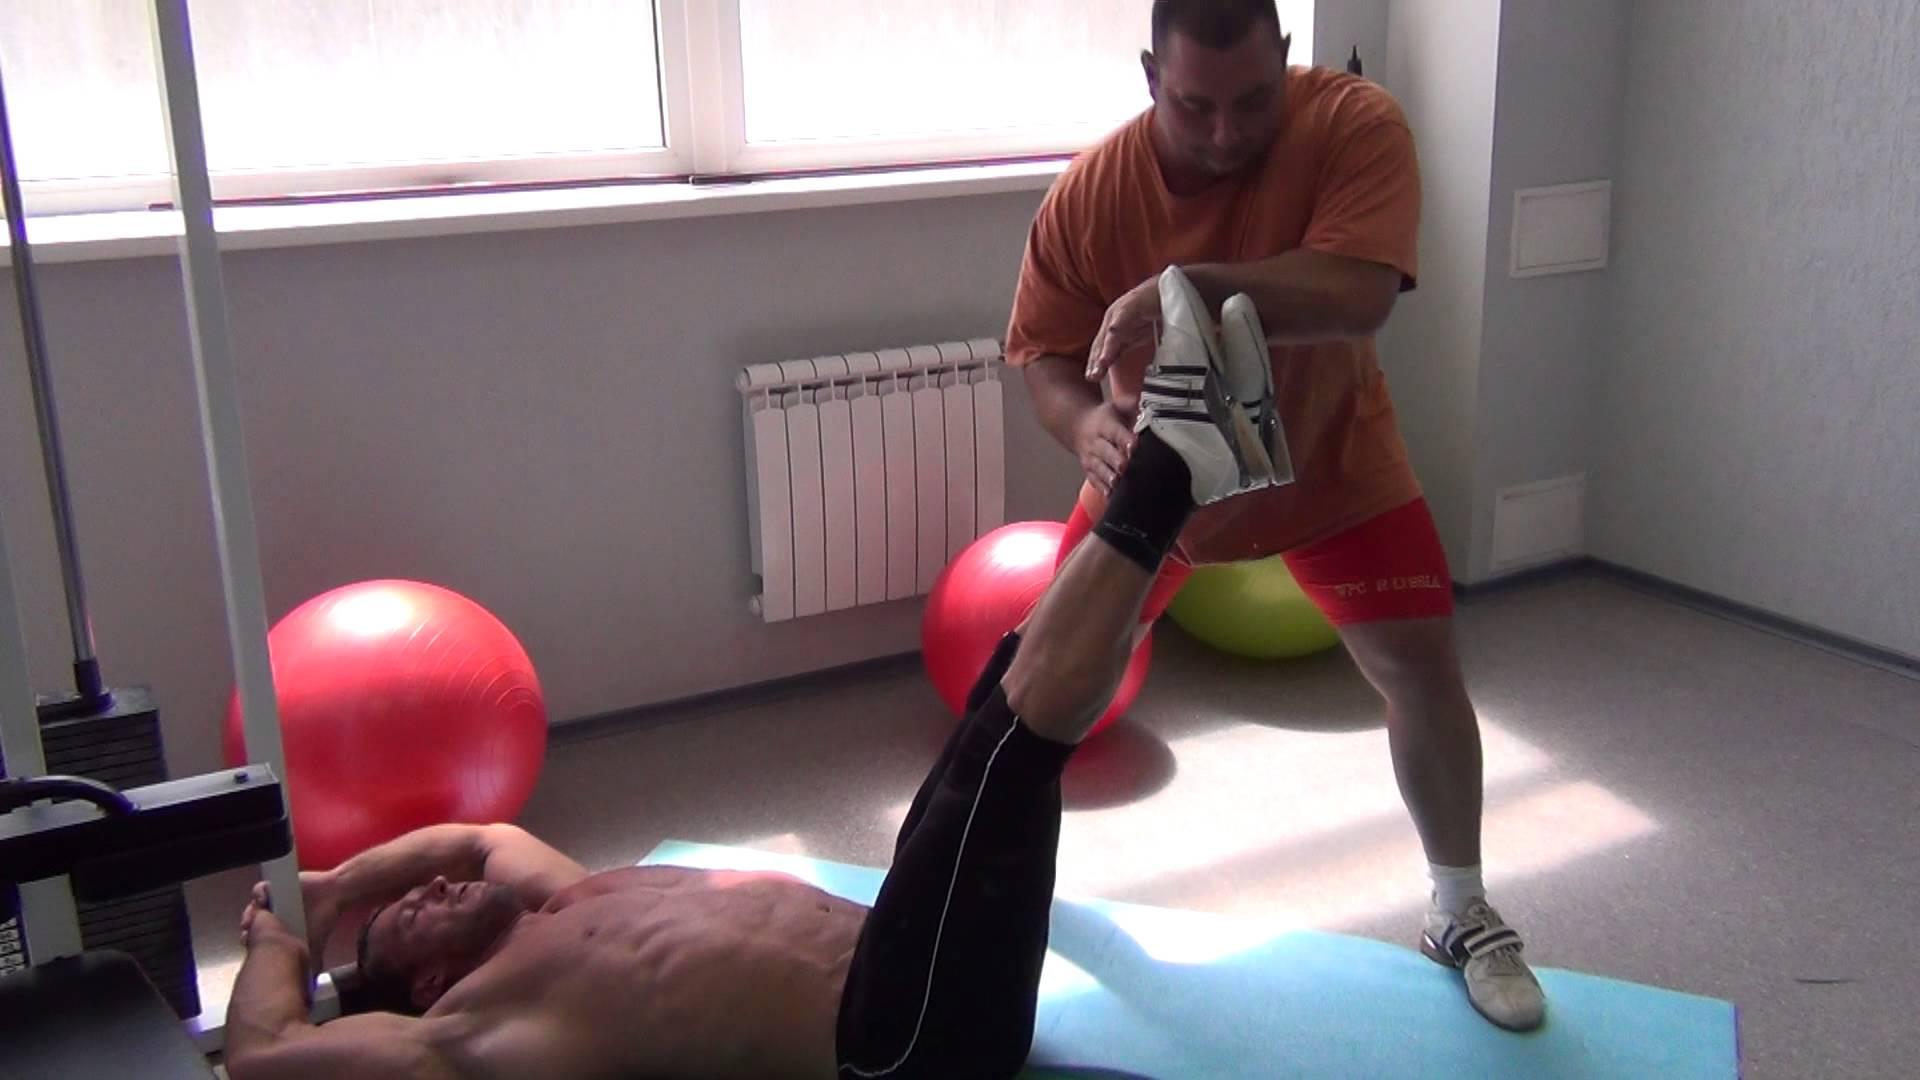 Dmitry Klokov Ab Workout - All Things Gym